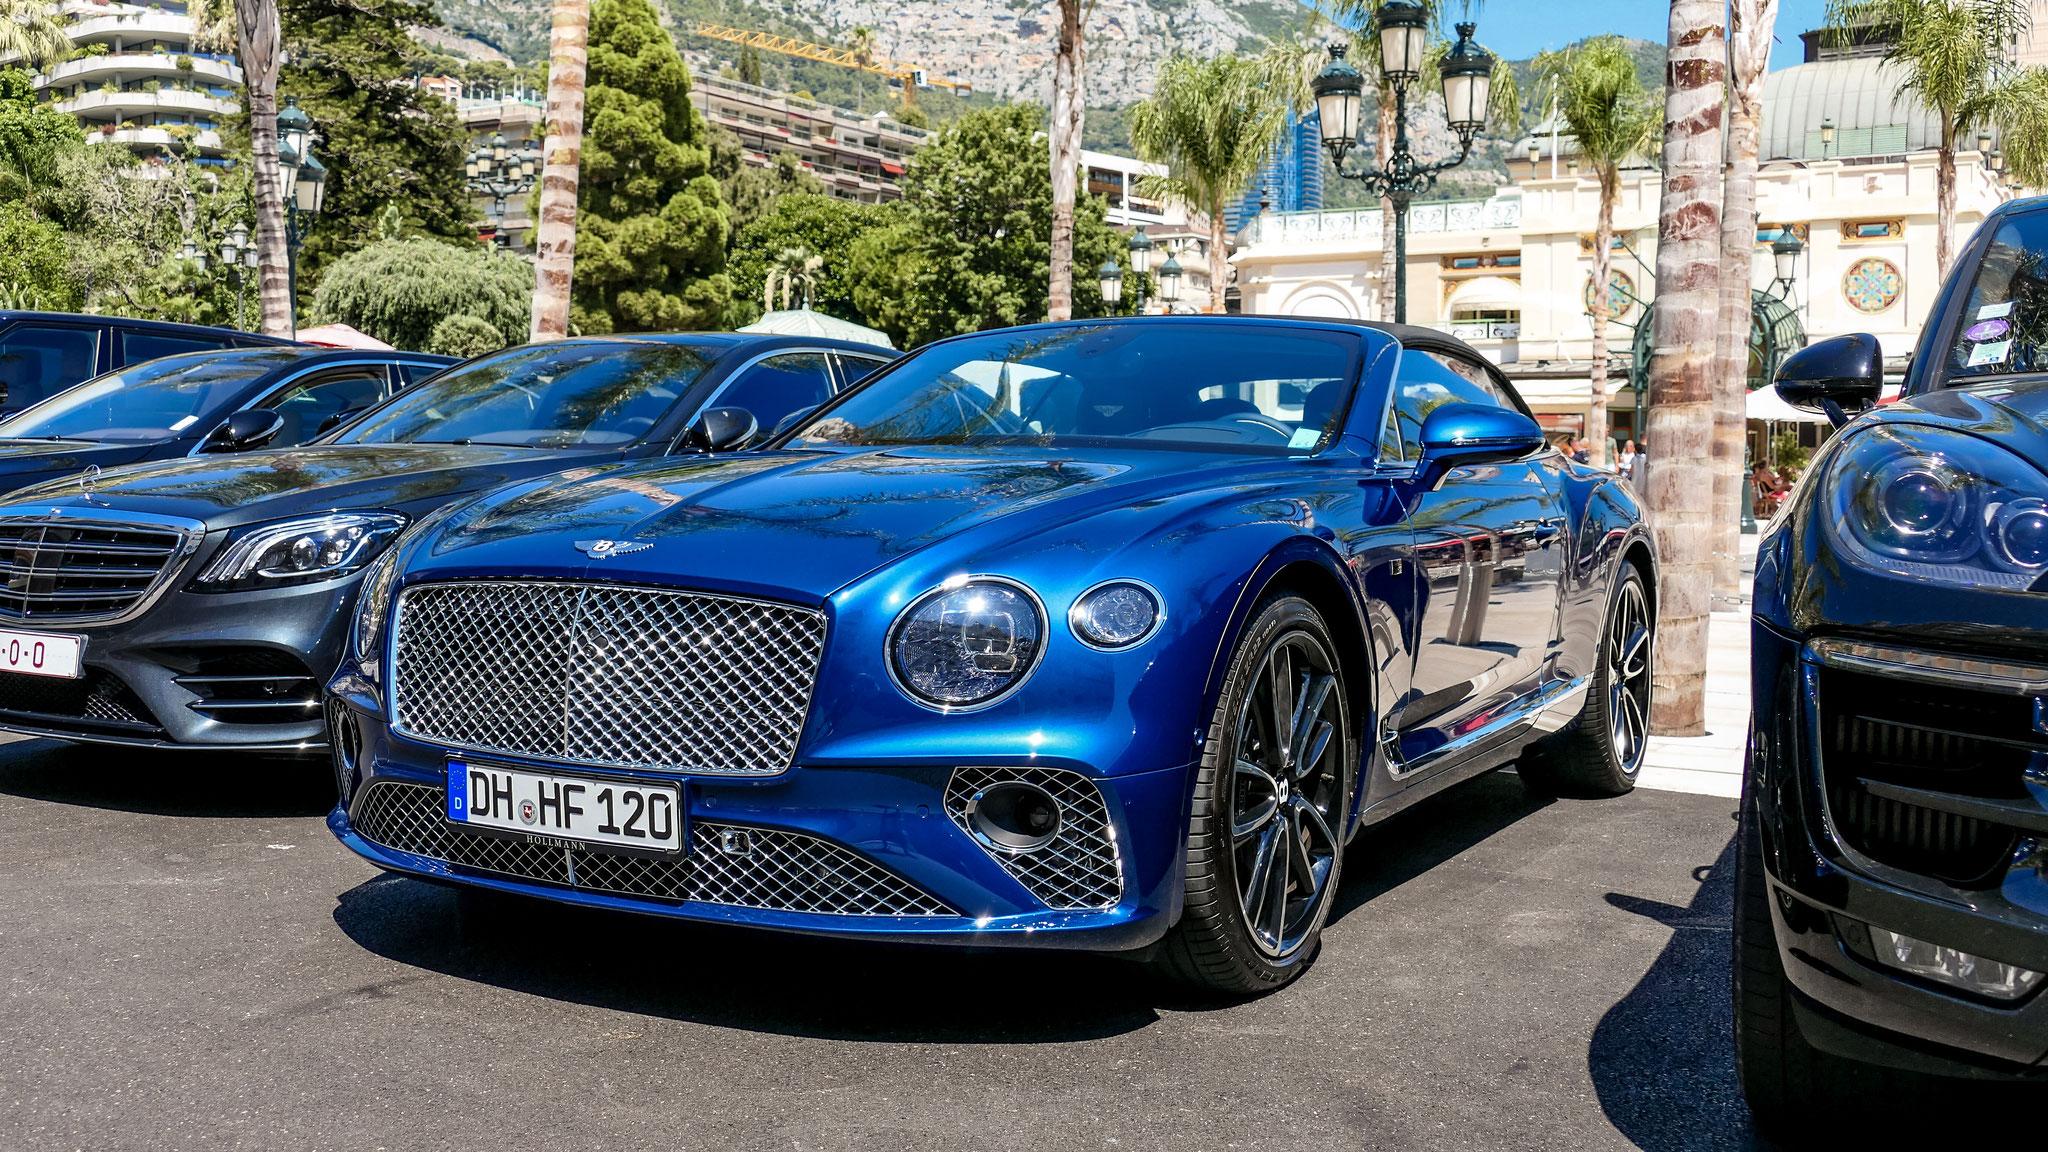 Bentley Continental GTC - DH-HF-120